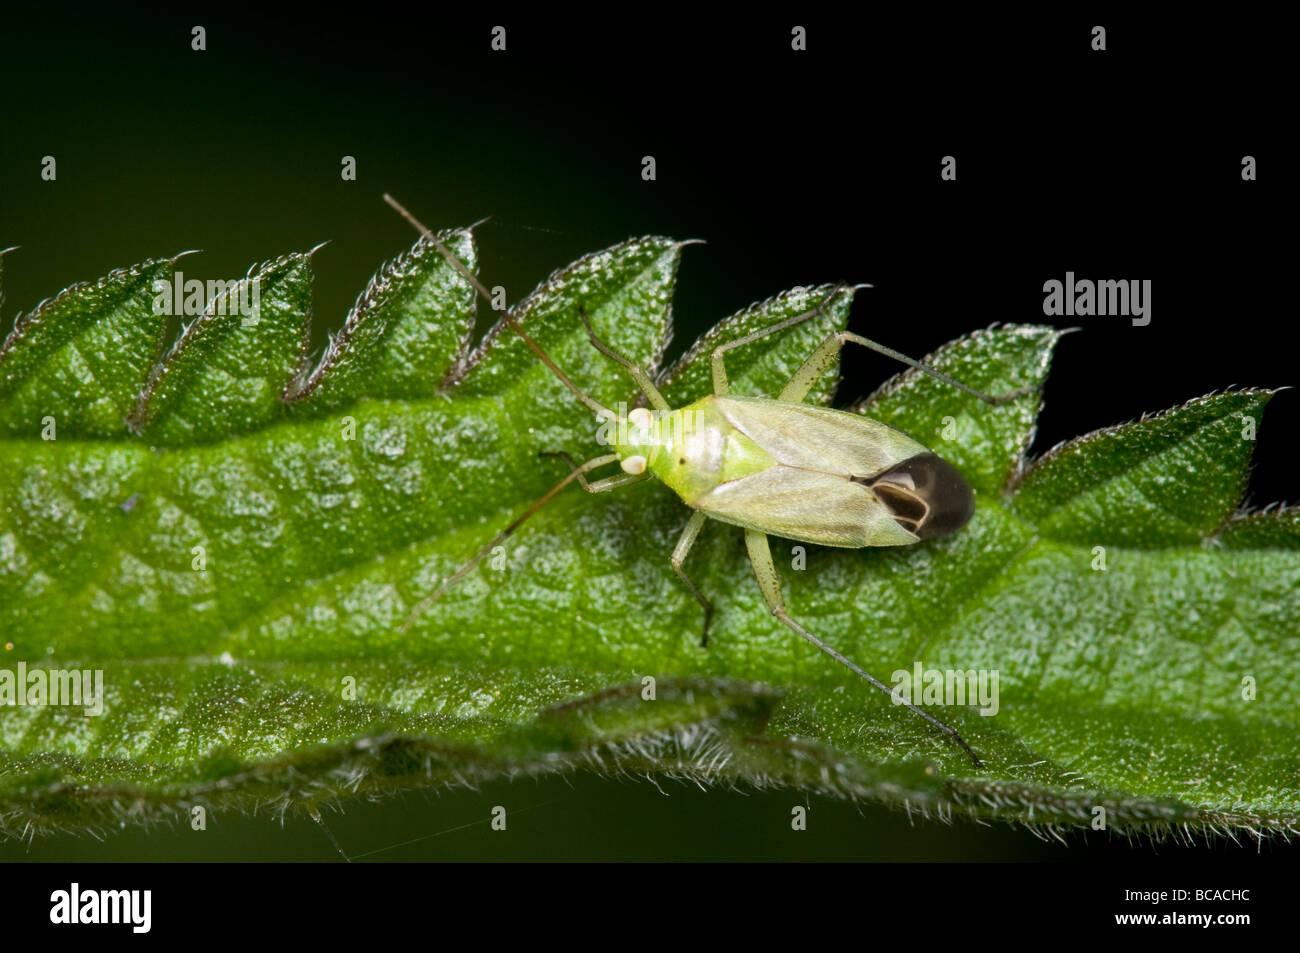 Potato Capsid bug - Stock Image